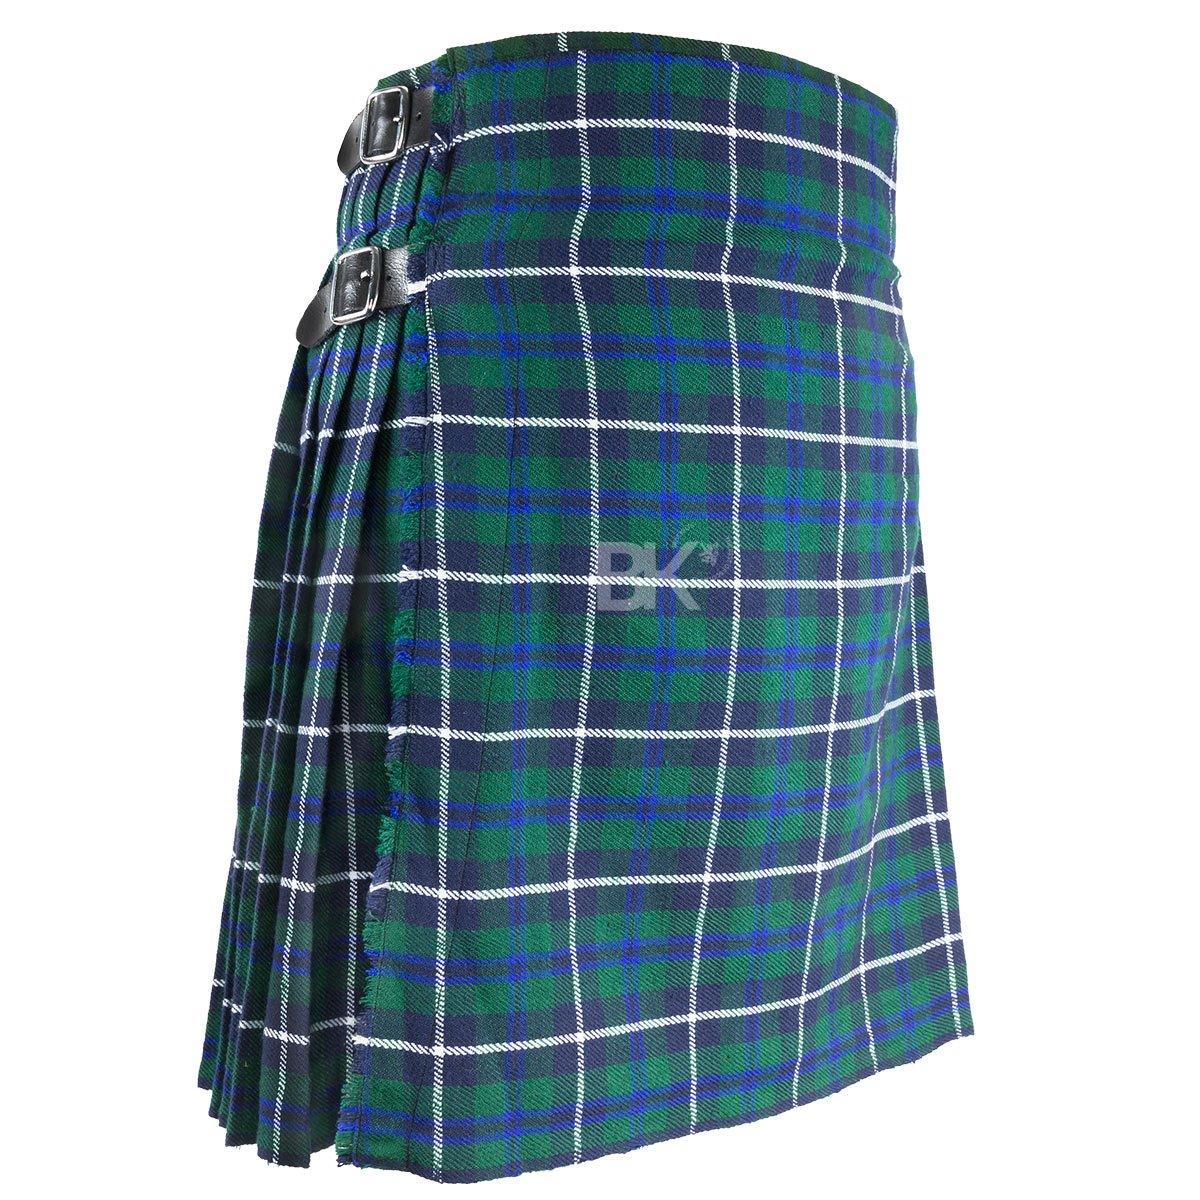 "Best Kilts Men's Traditional Scottish 5 Yard Douglas Tartan Kilt 34""-36"""